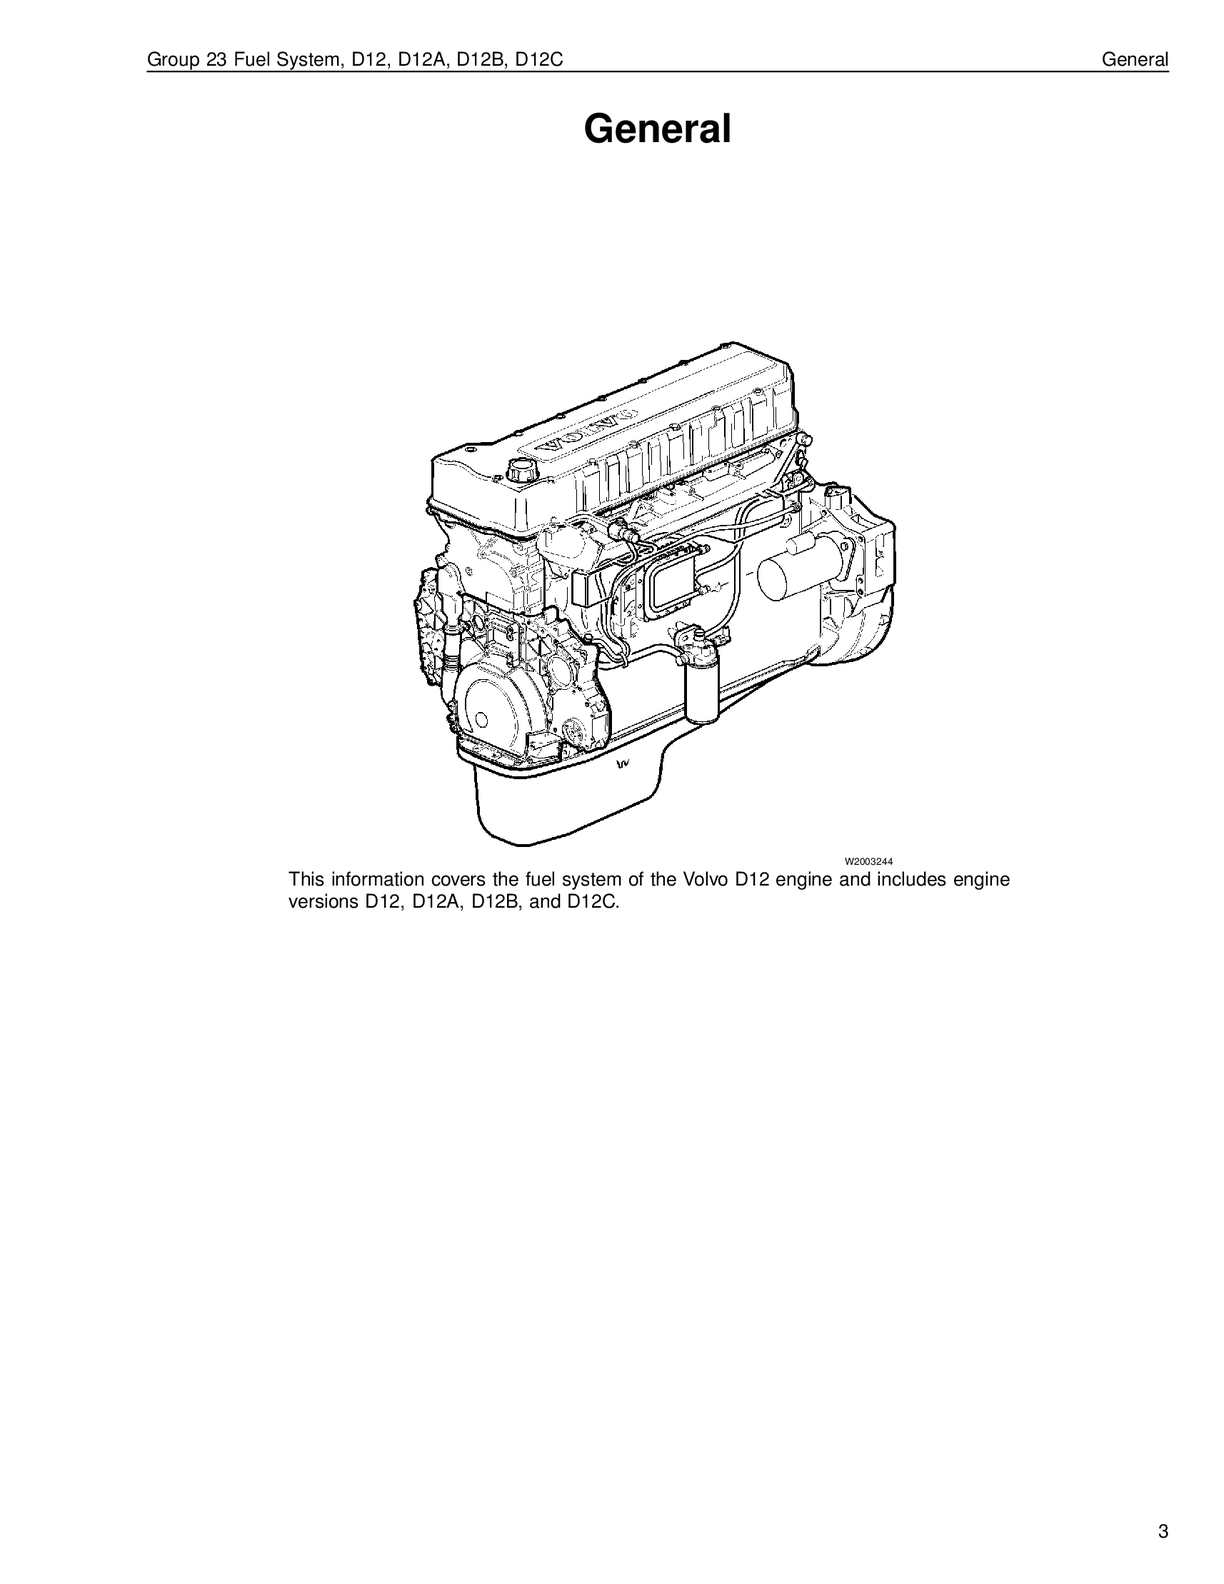 Volvo Fuel System D12 D12a D12b D12c